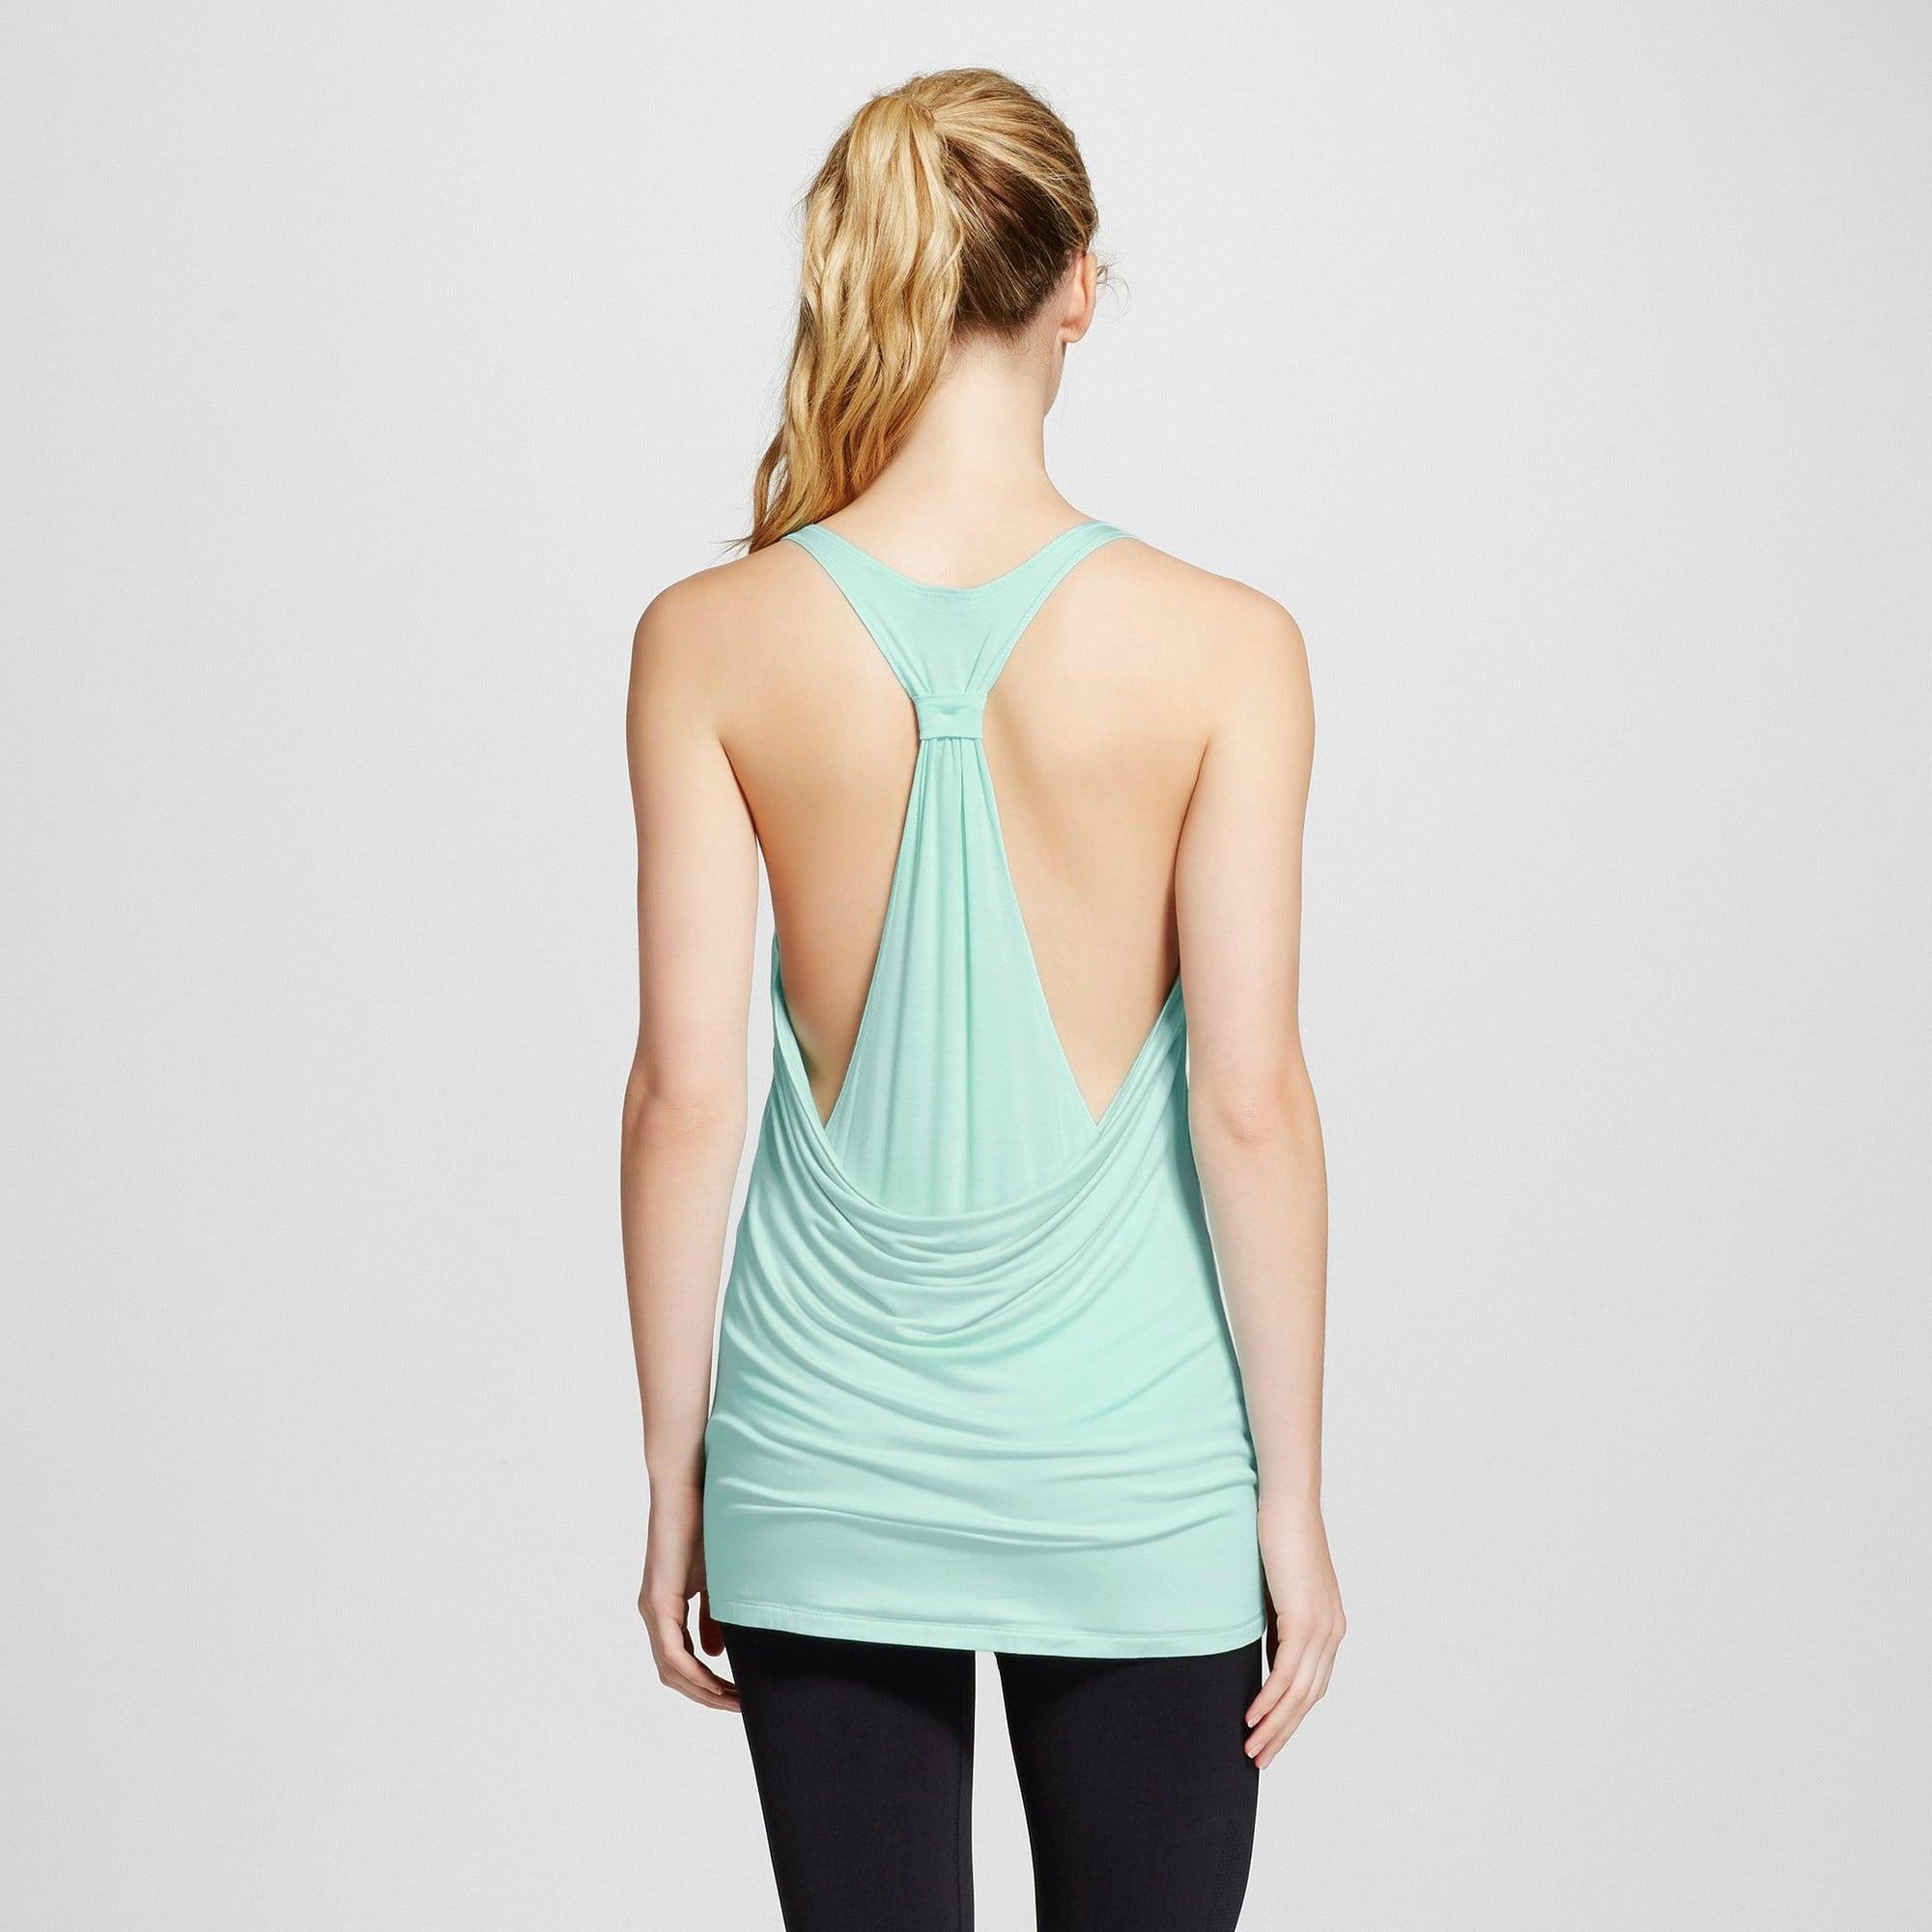 Mint Green Workout Clothes